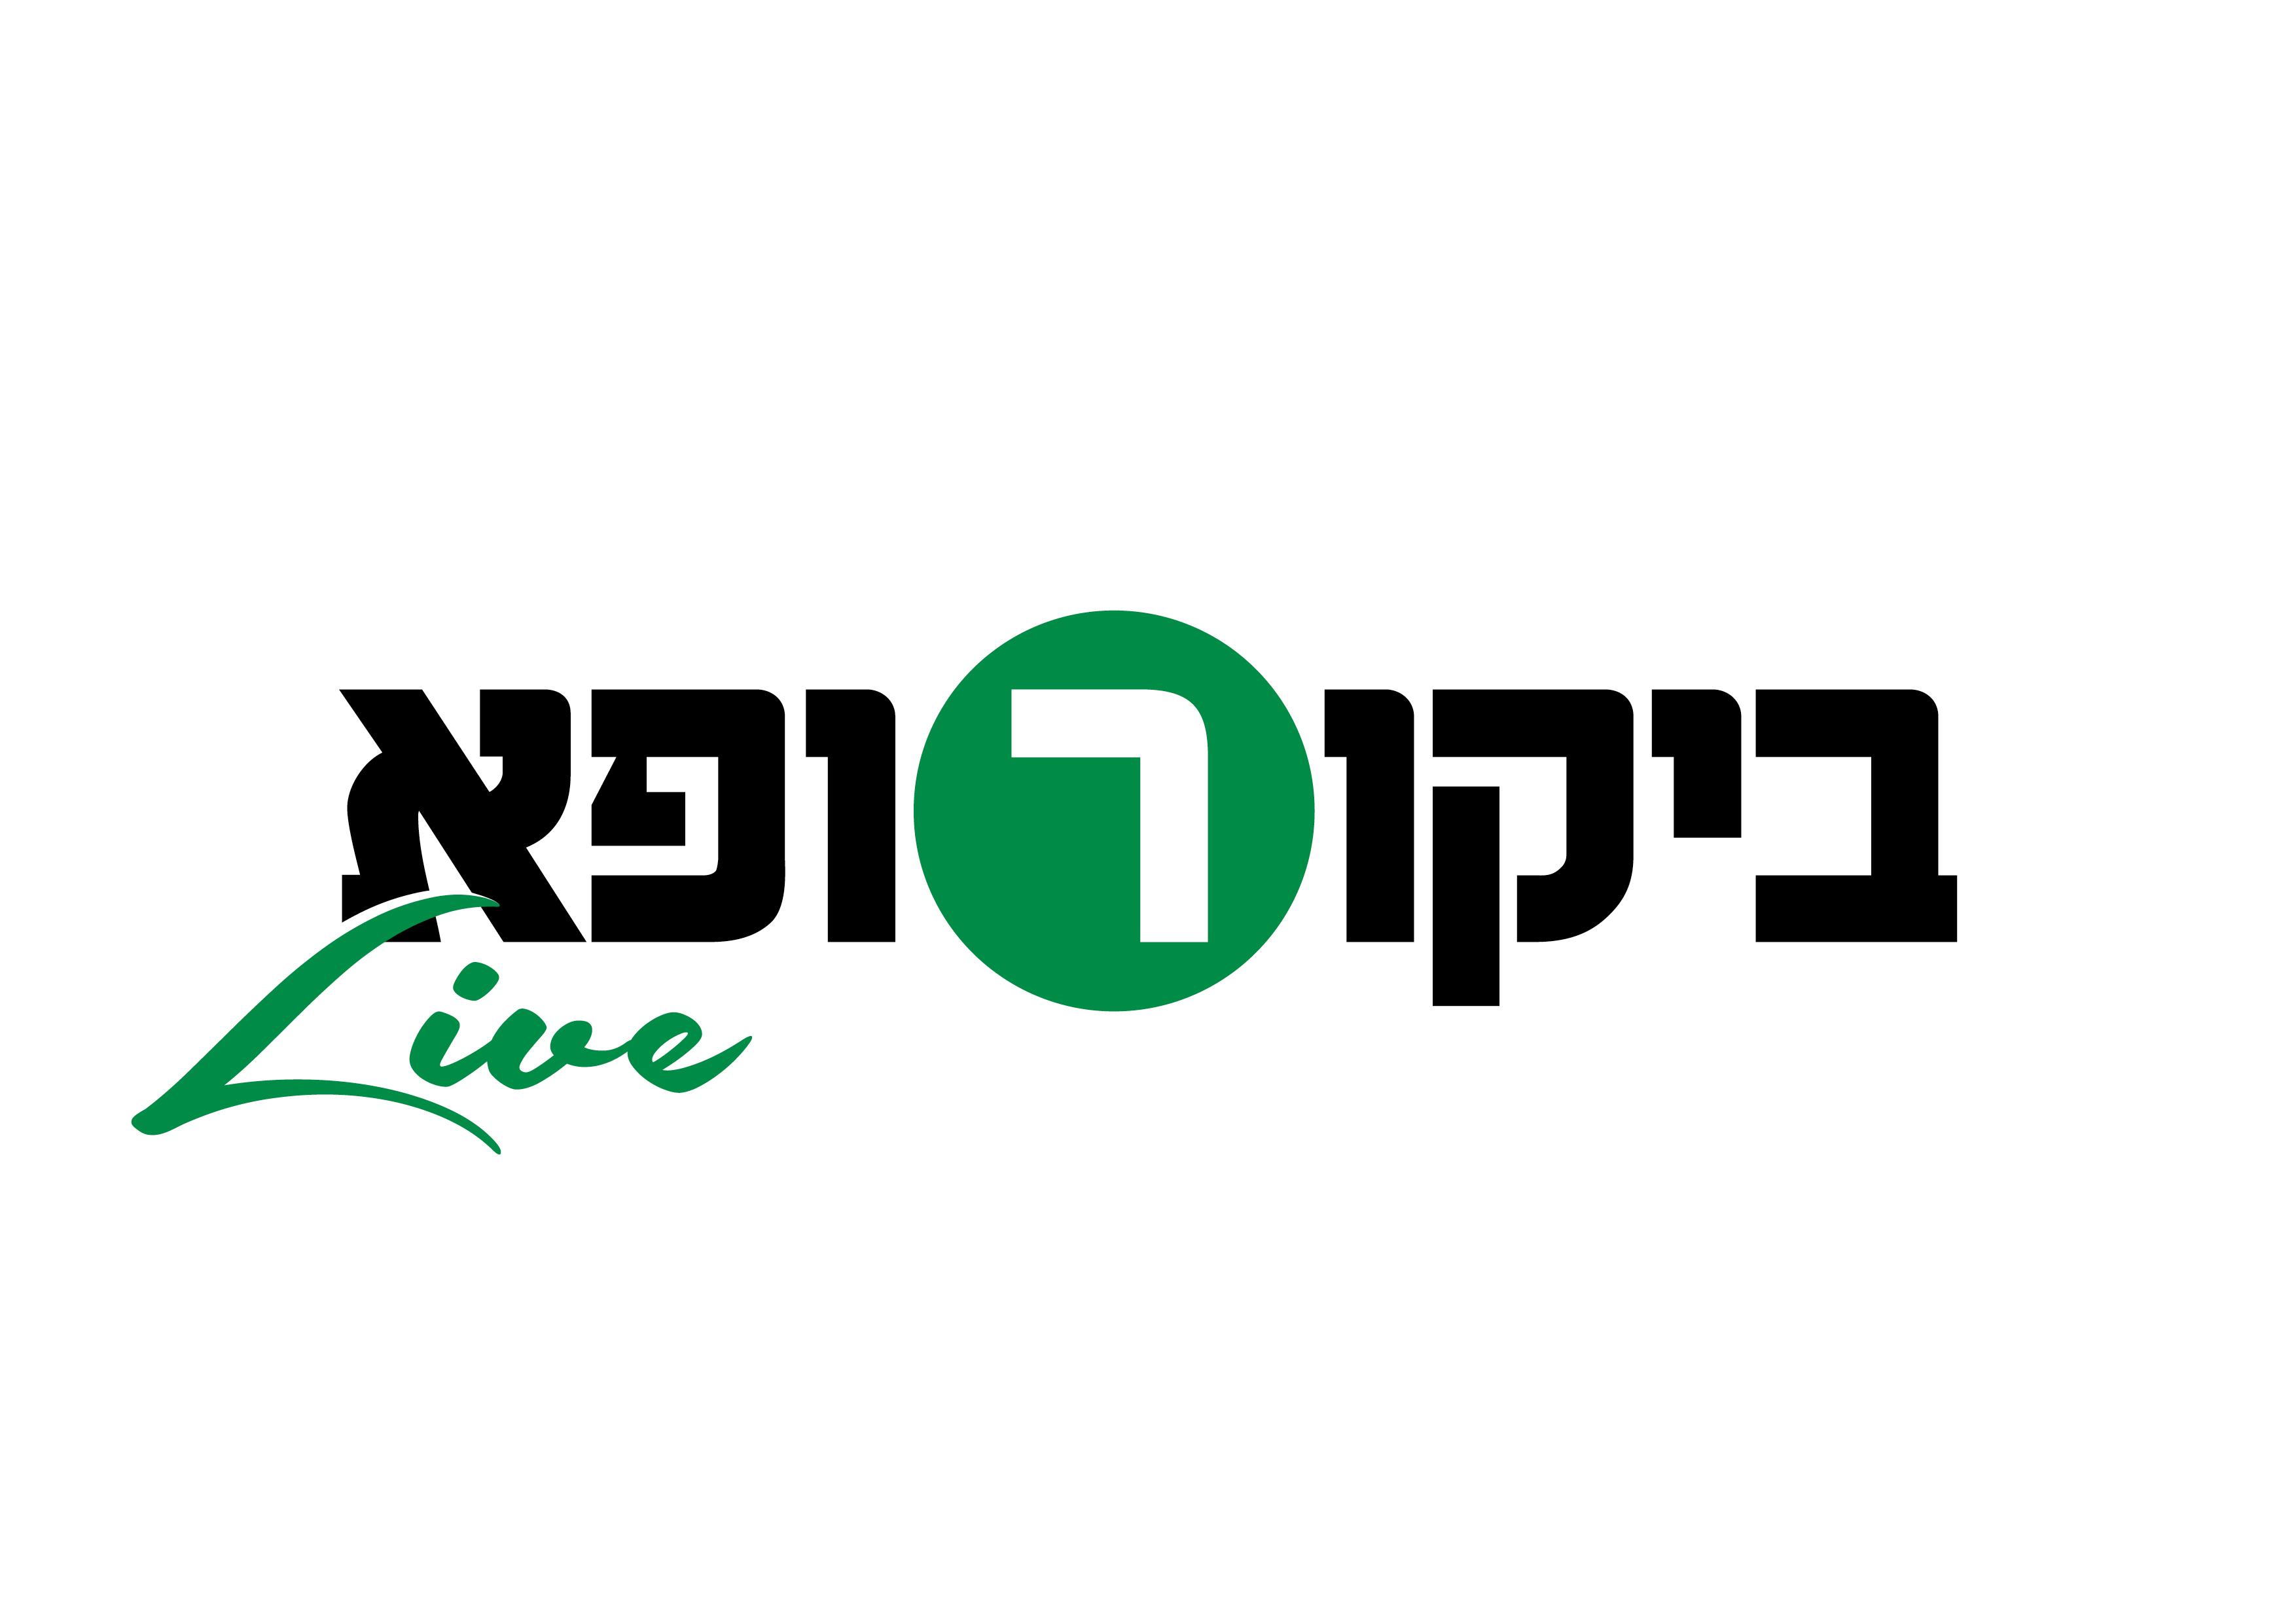 Bikurofe_Live_APP_logo_design